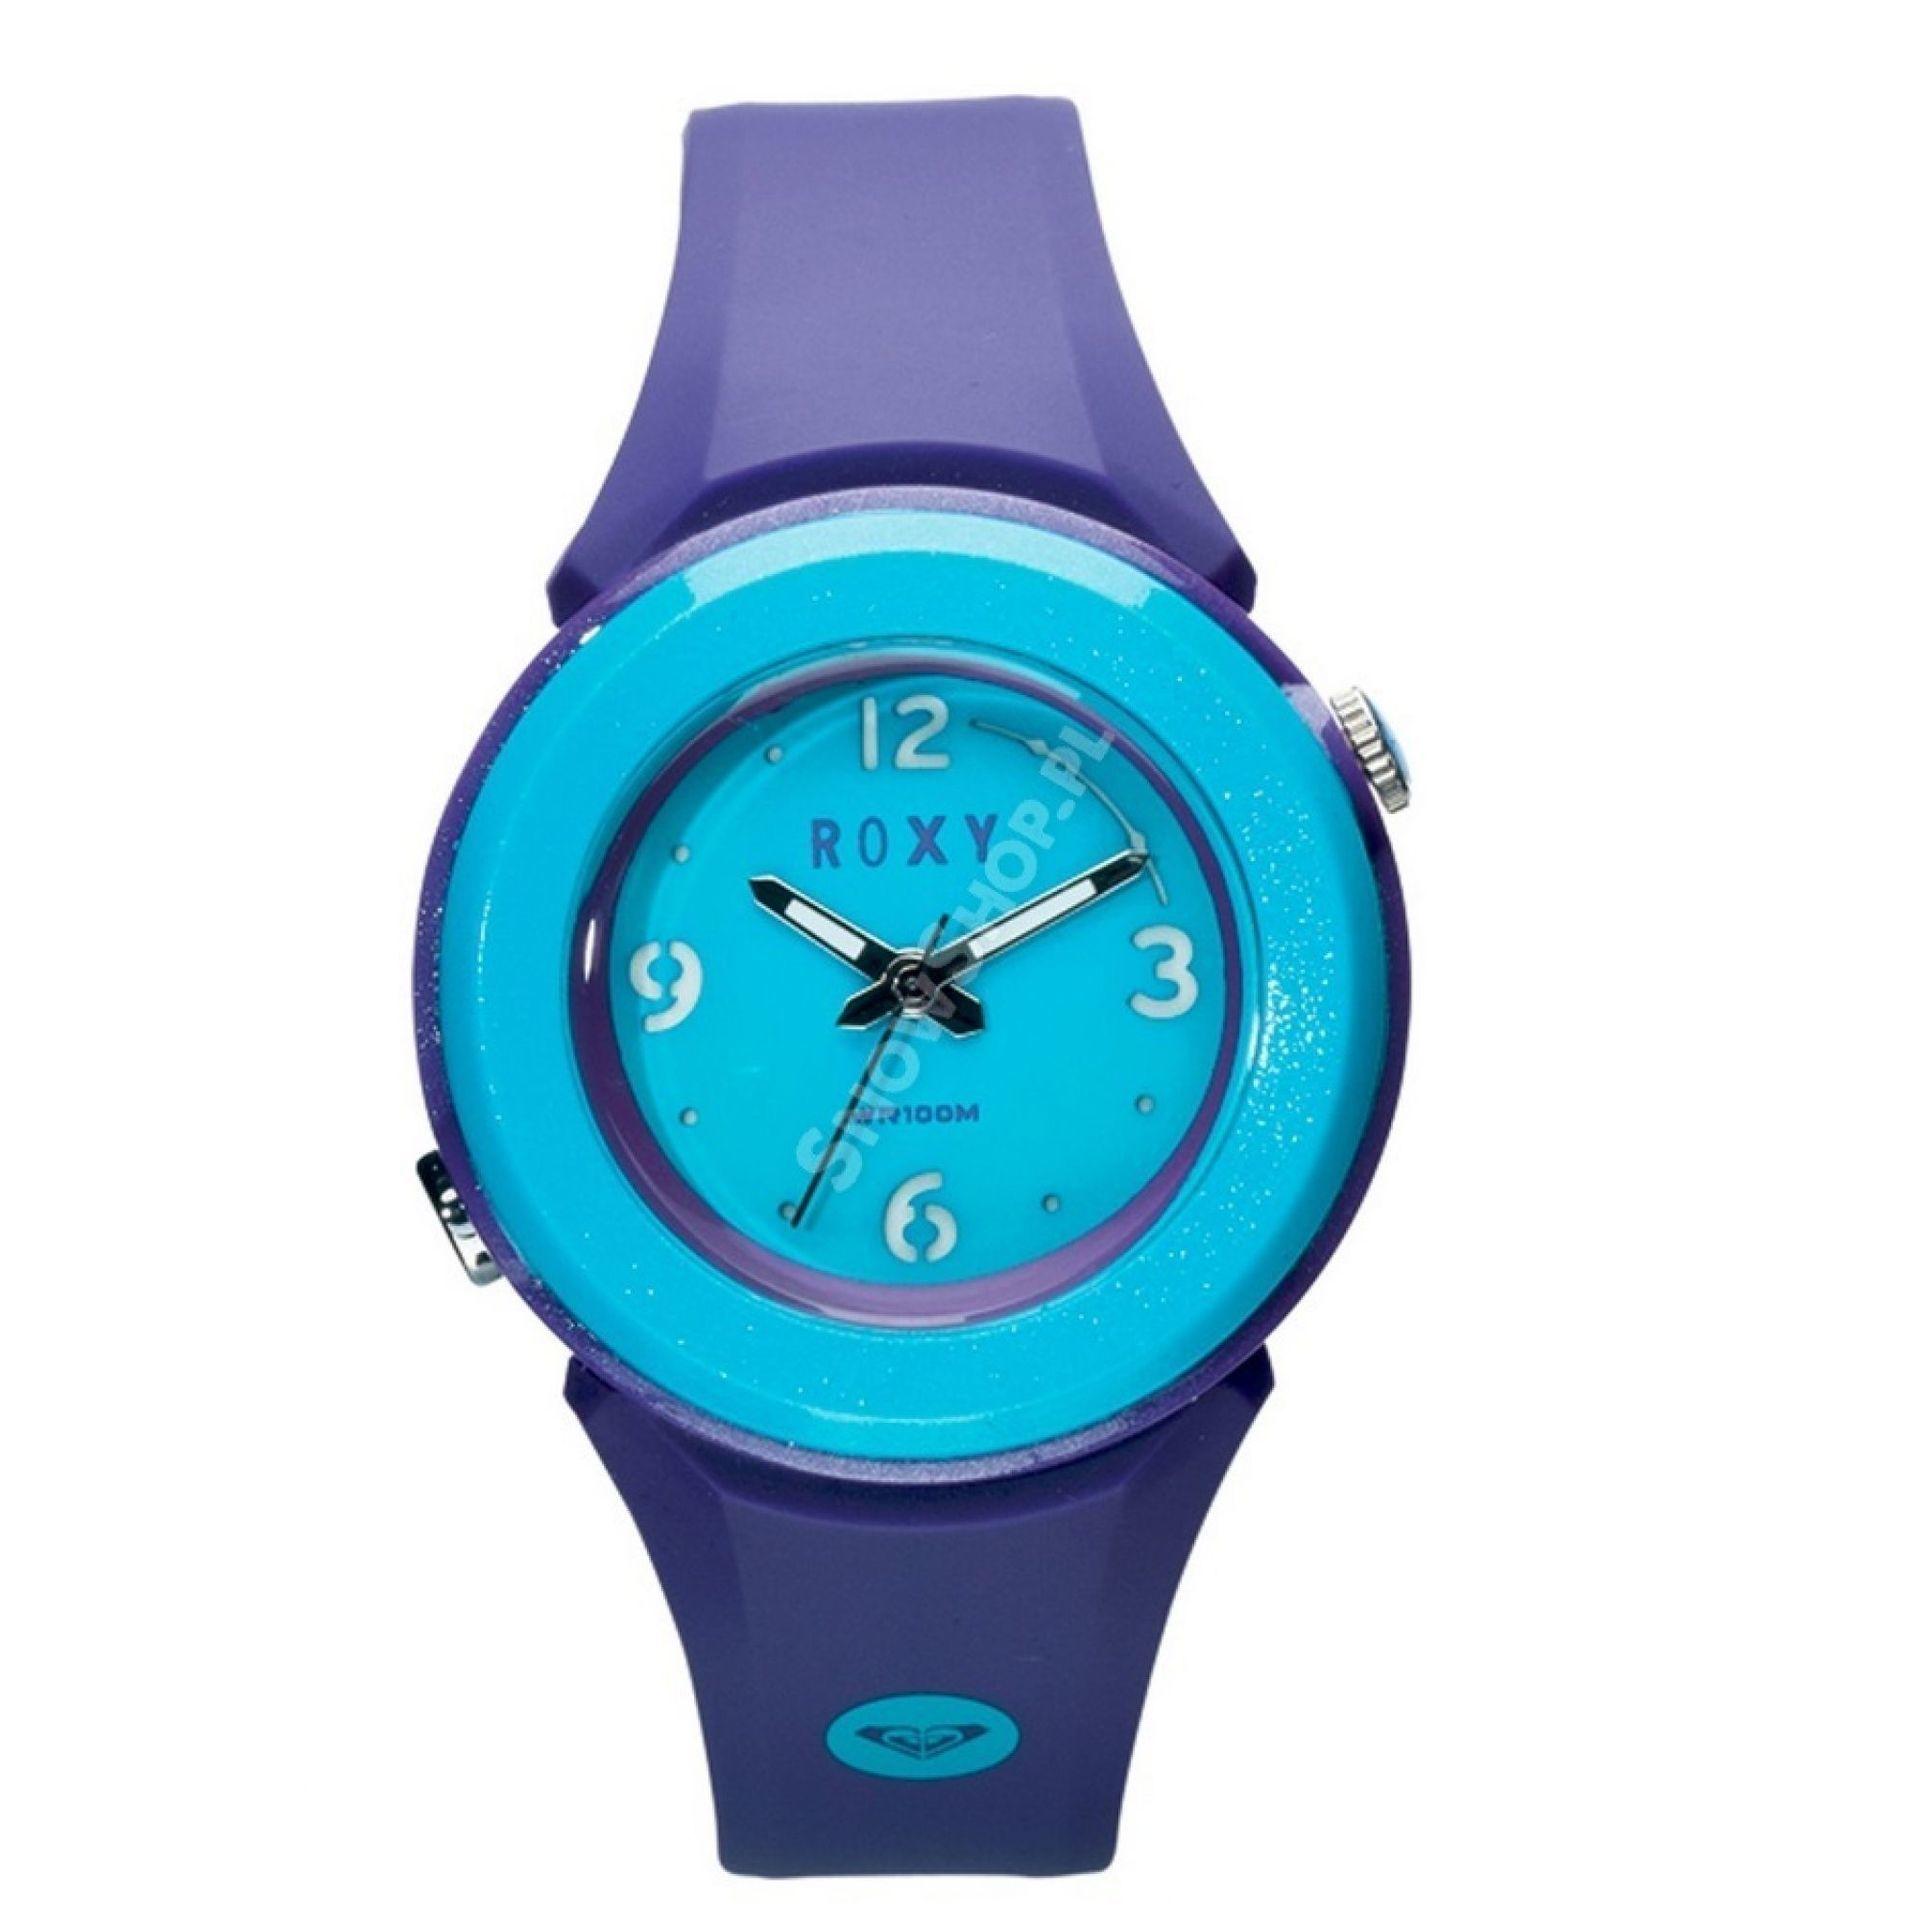 Zegarek Roxy Bright fioletowy